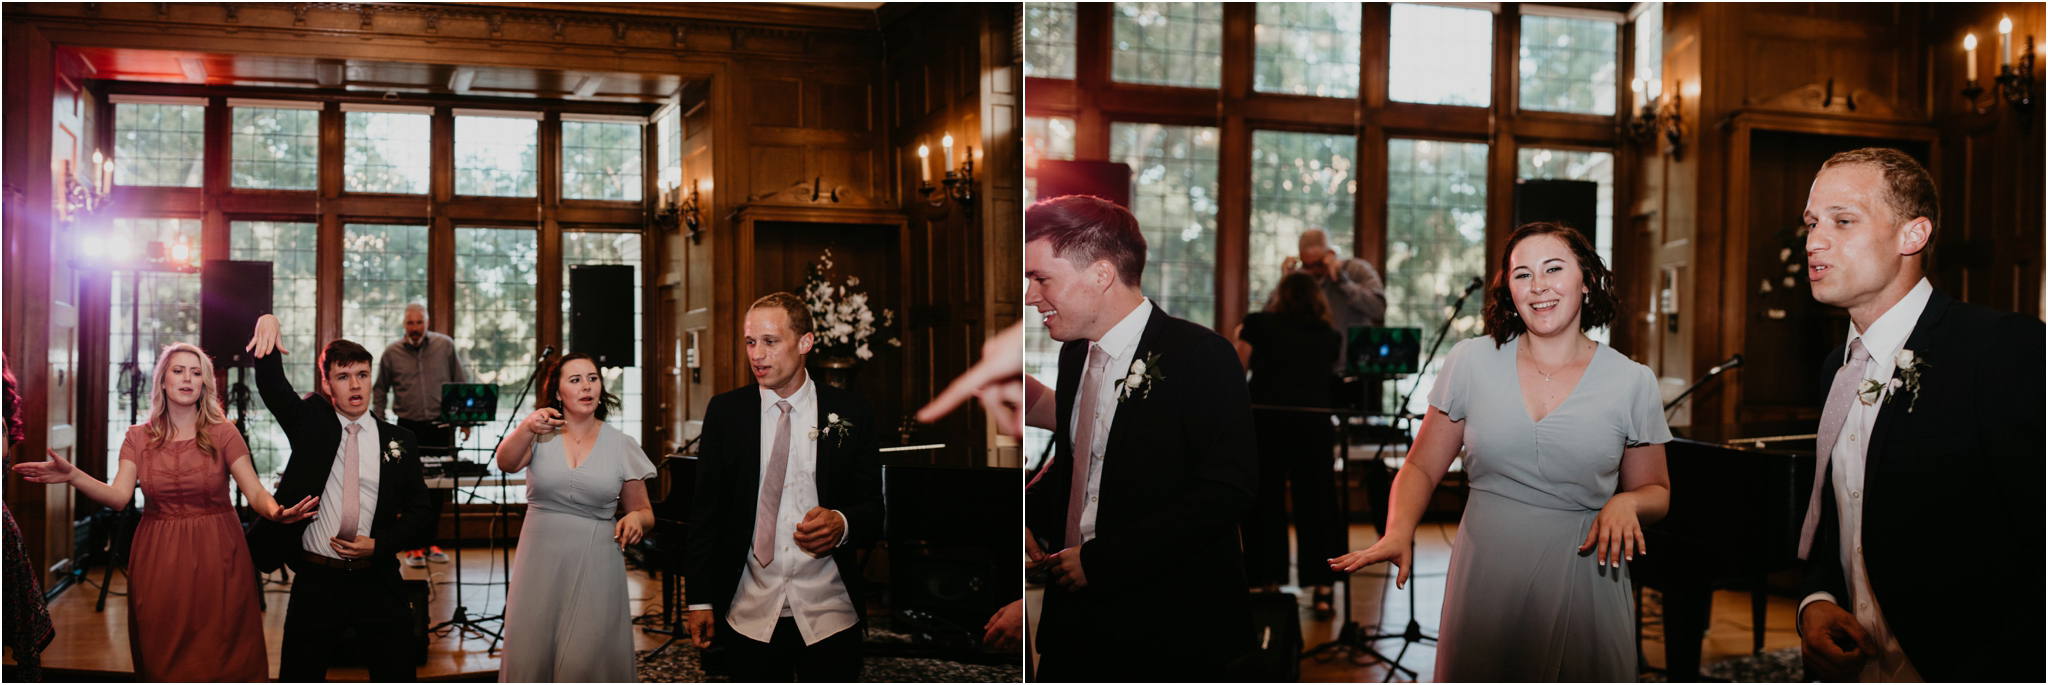 chance-and-ondrea-lairmont-manor-wedding-seattle-photographer-139.jpg